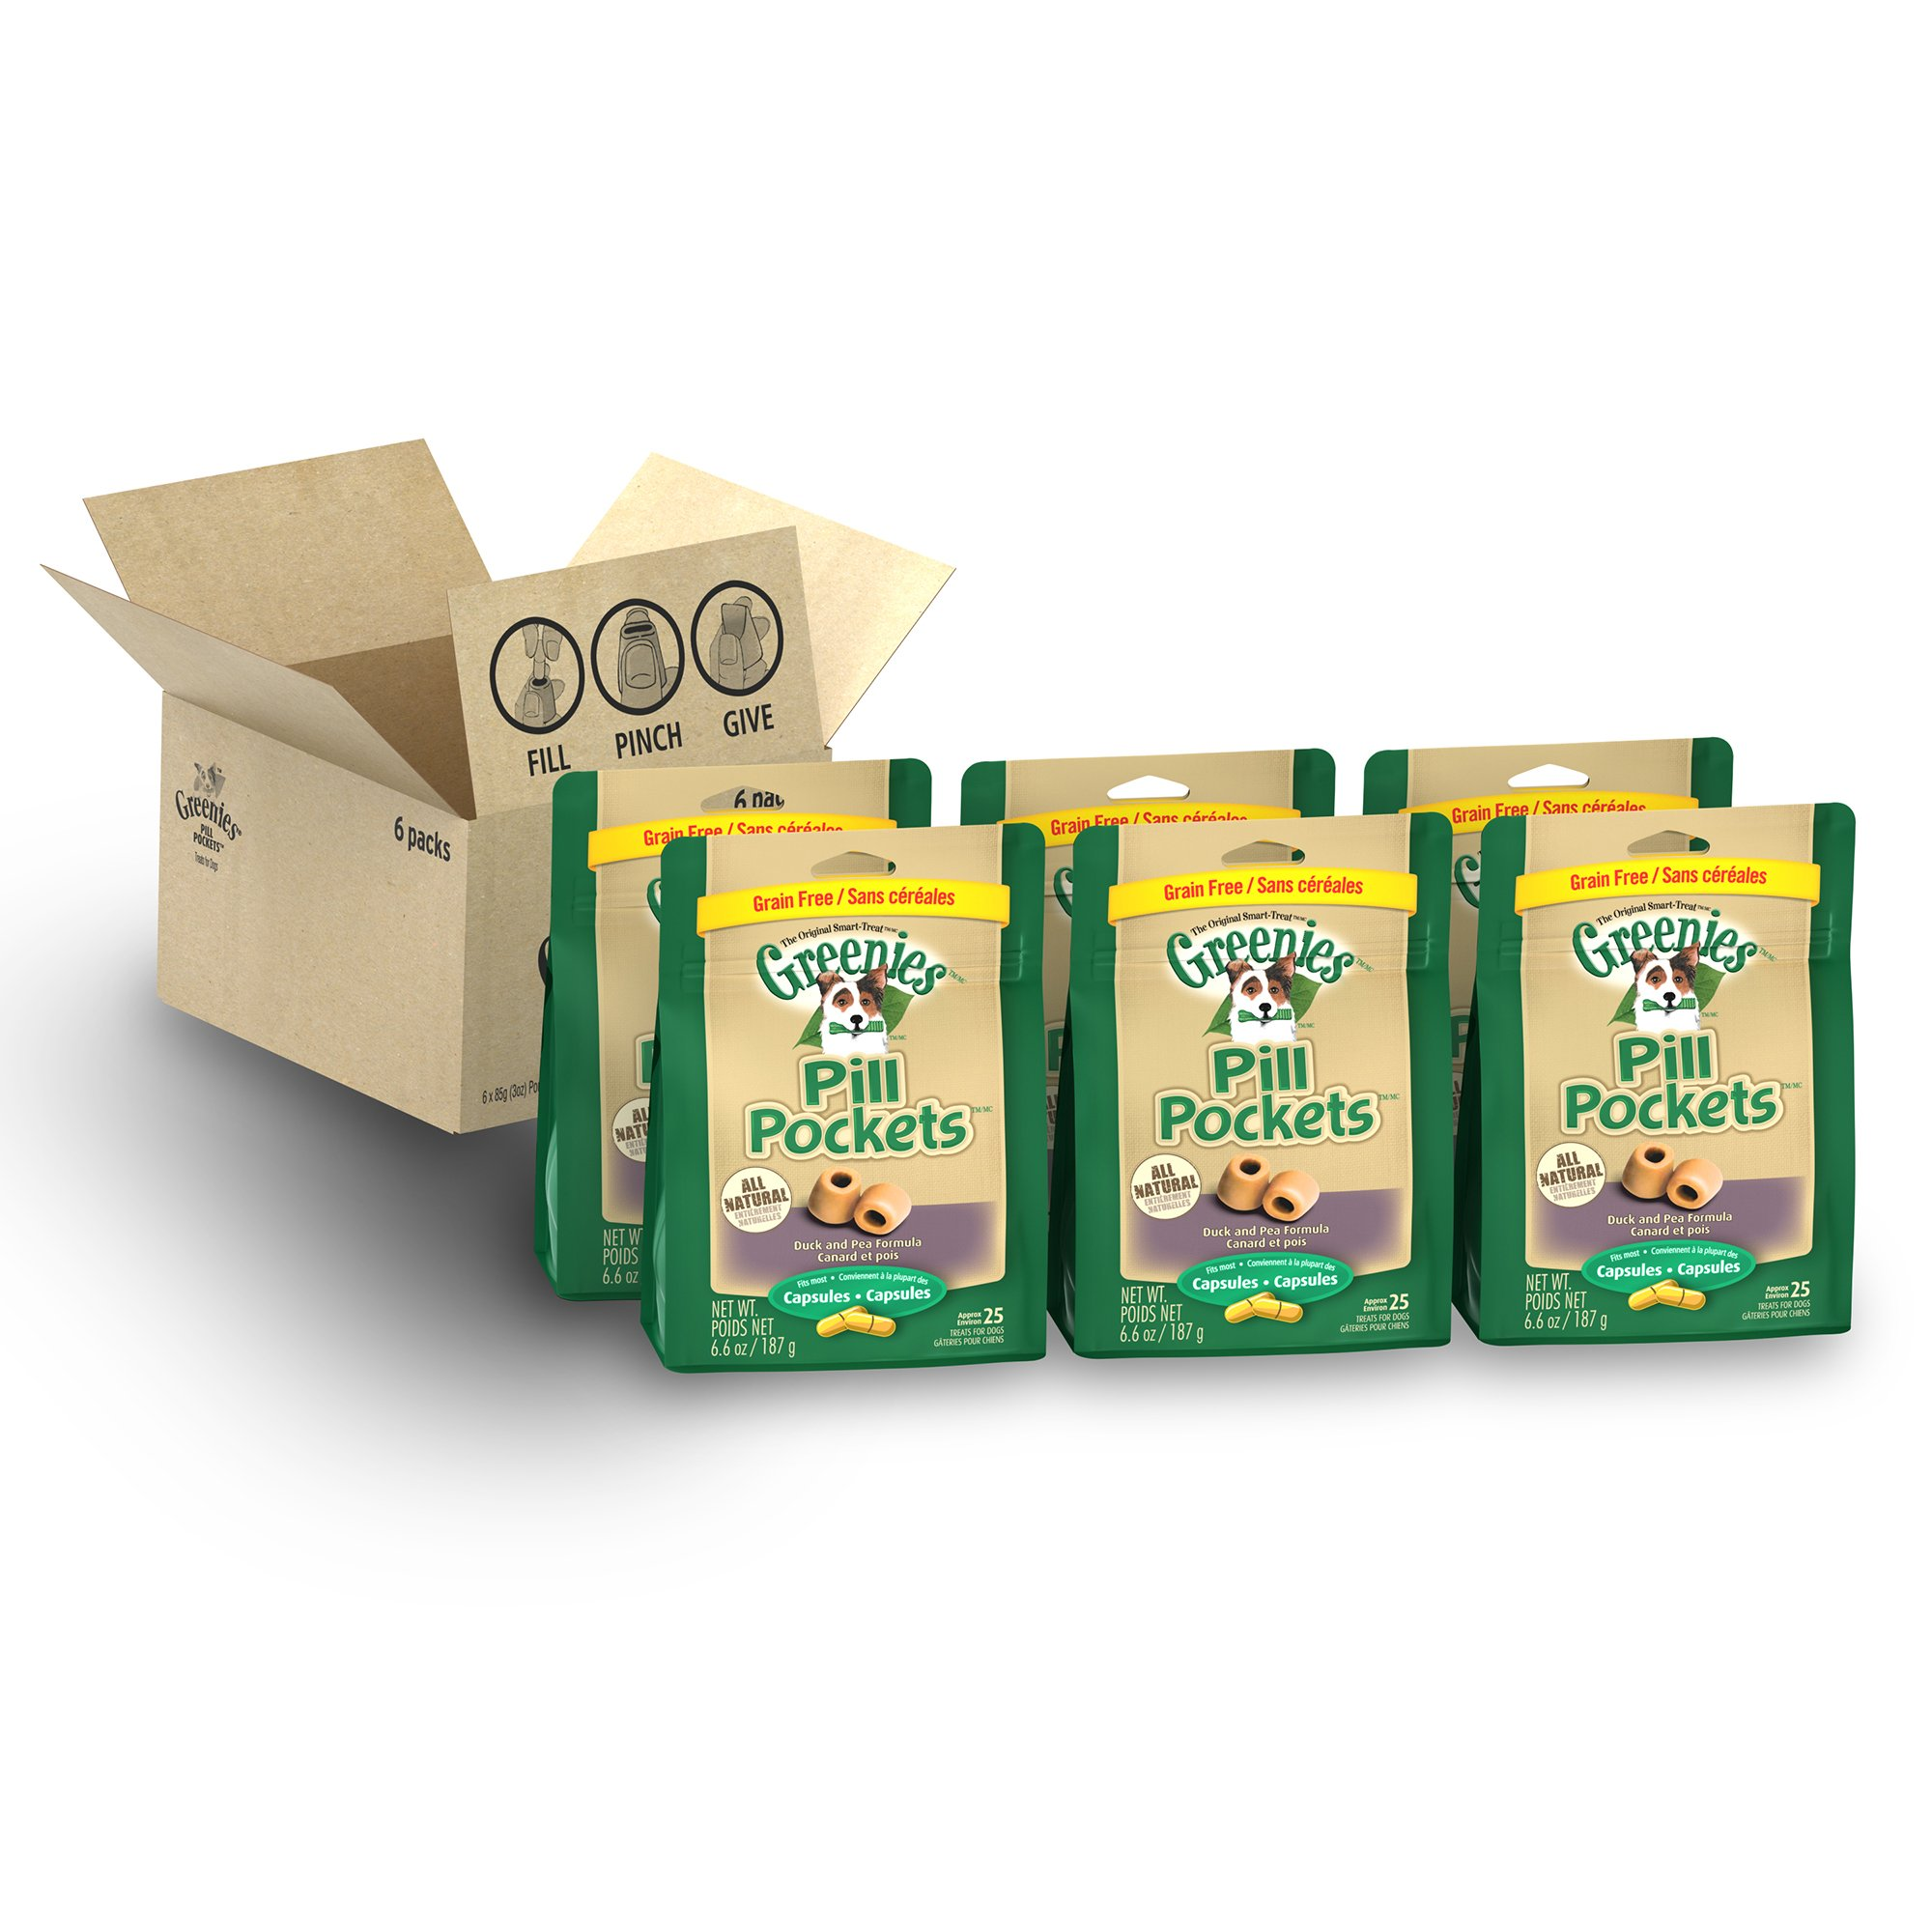 Greenies PILL POCKETS Grain Free Capsule Size Dog Treats Duck and Pea Formula, (6) 6.6 oz. Packs (150 Treats)